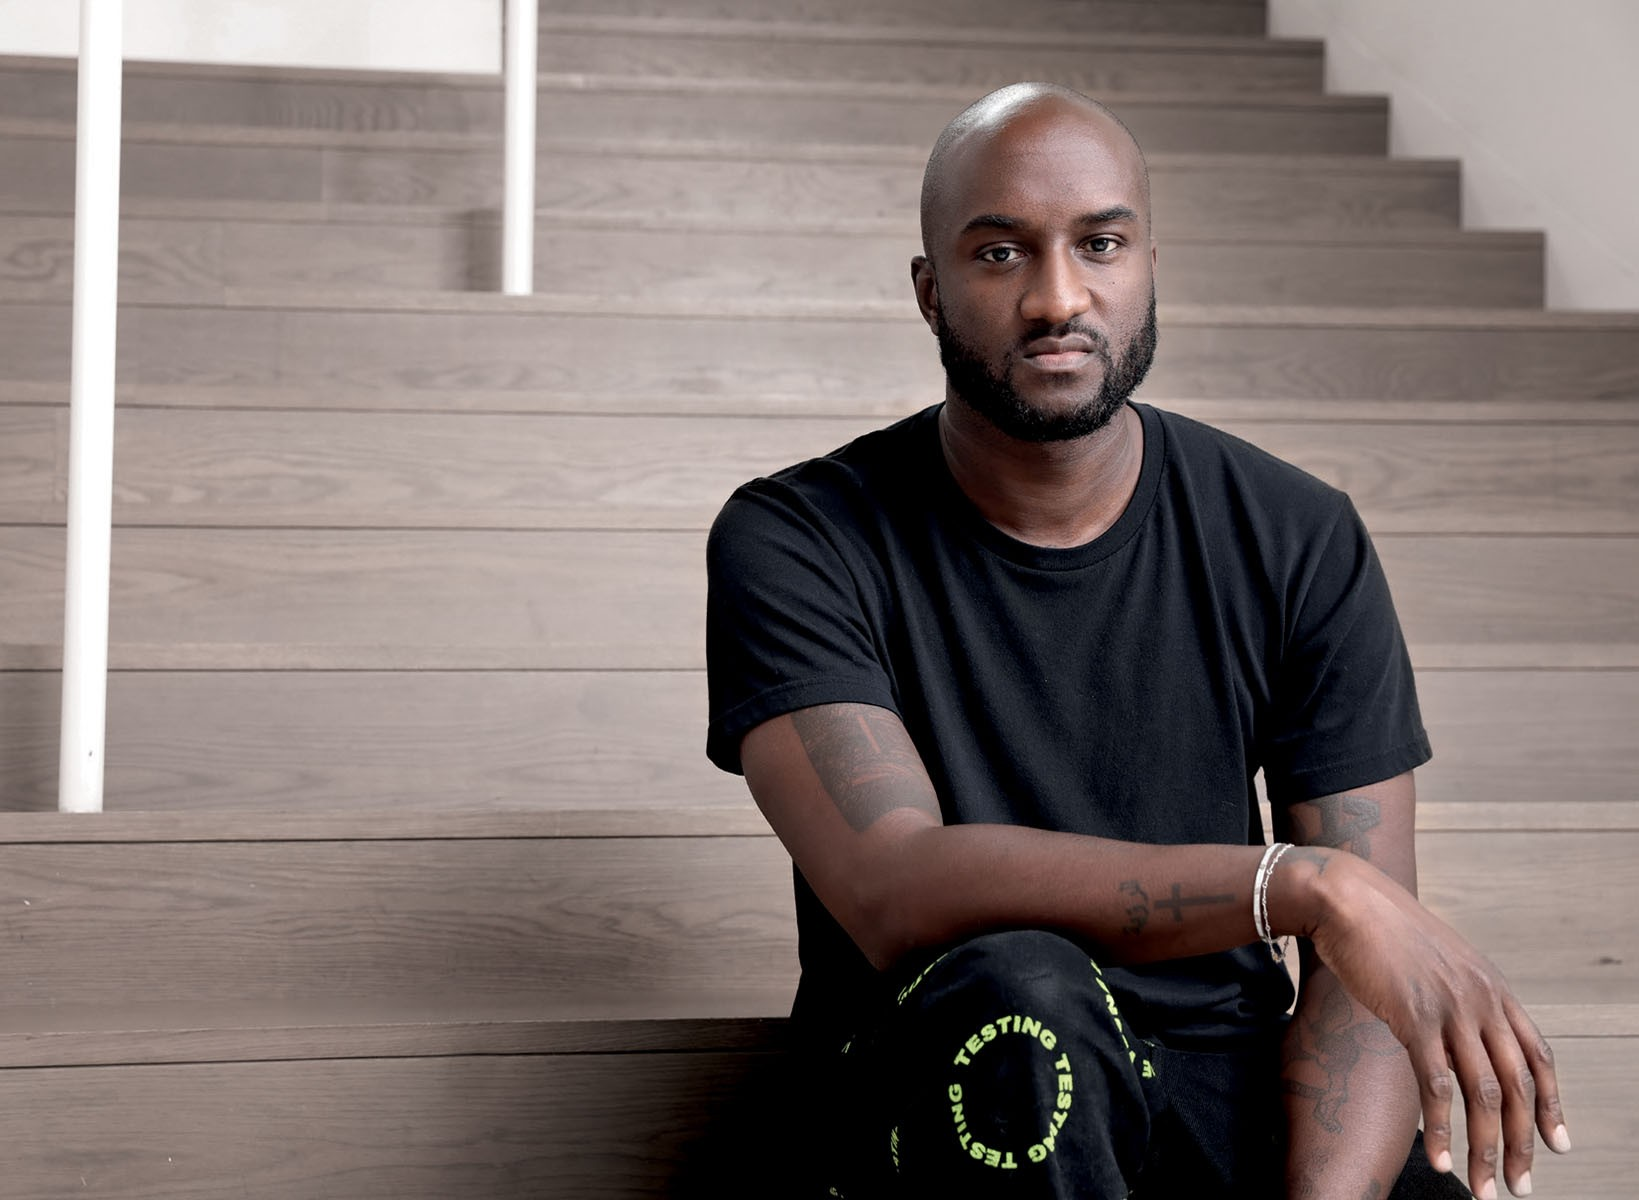 Grandes nomes do mercado de luxo demonstram seu apoio ao movimento #BlackLivesMatter